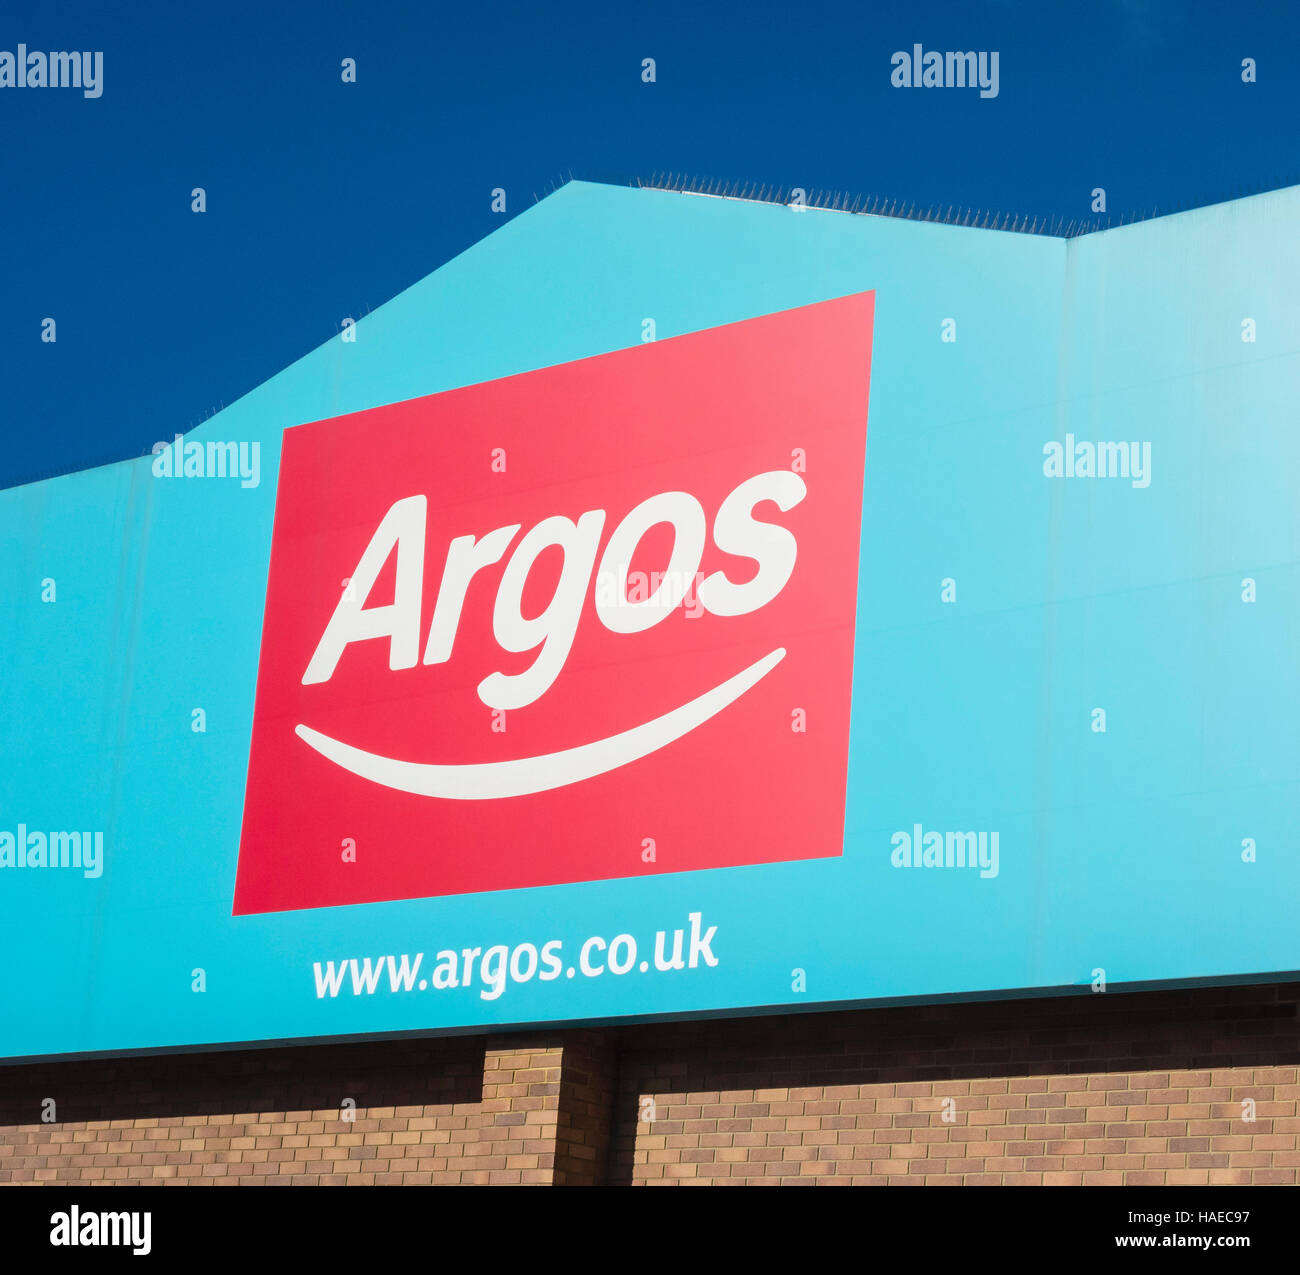 Sign for Argos store in Woking, Surrey, UK - Stock Image